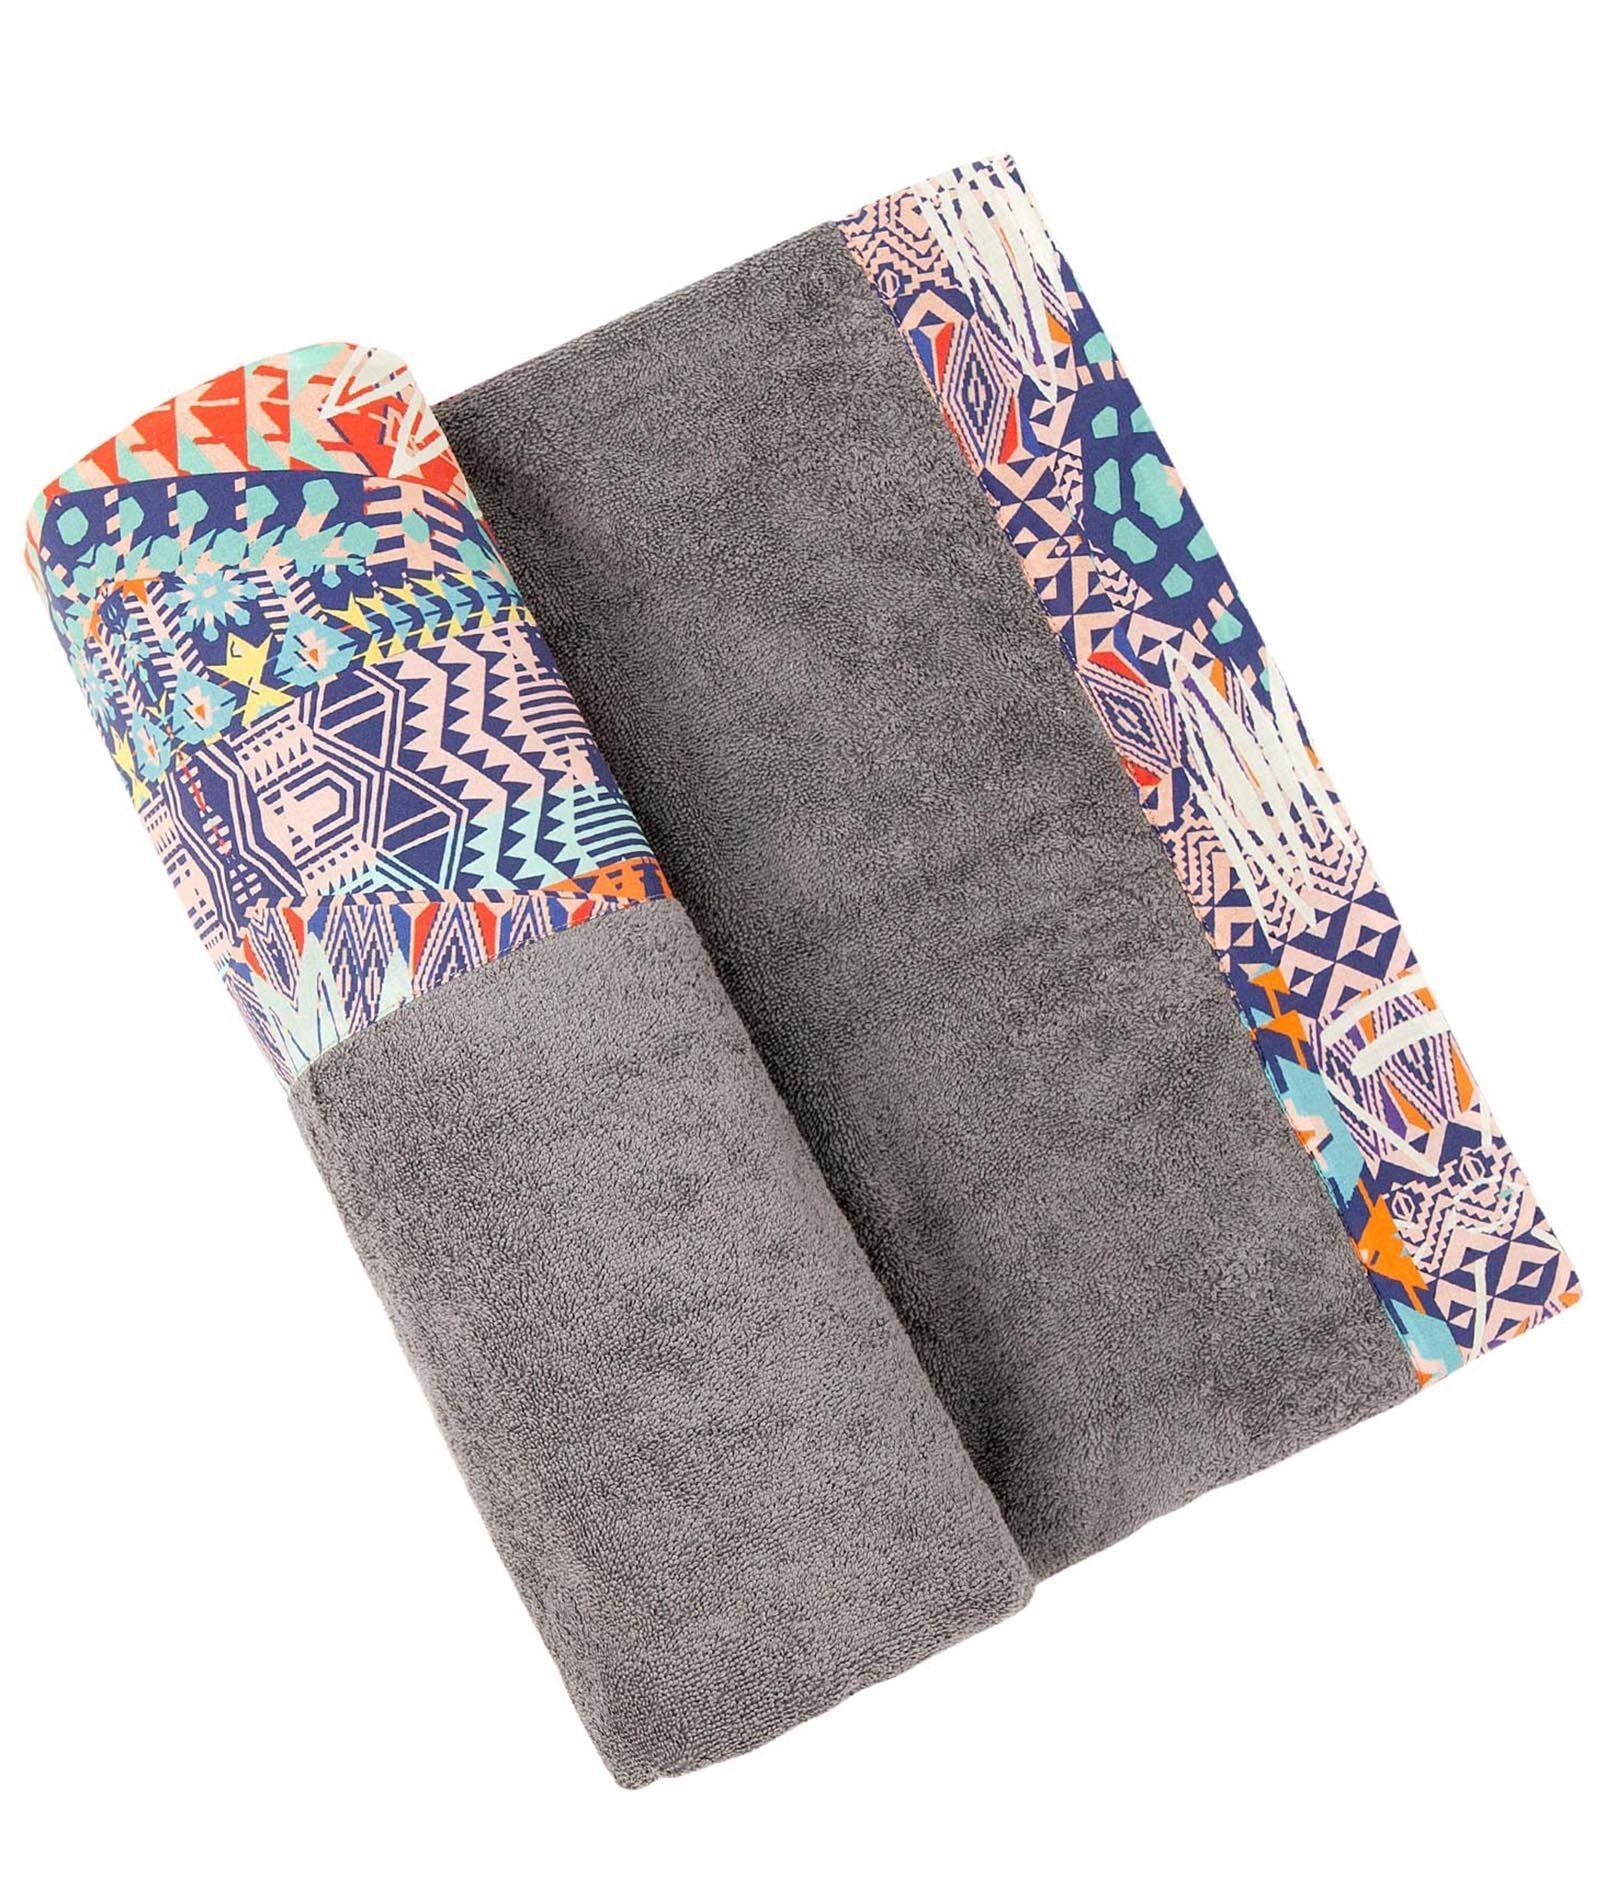 Sun Of A Beach Grey Aztec Beach Towel Gifts Aesthet Com With Images Beach Towel Gift Beach Towel Large Beach Towels